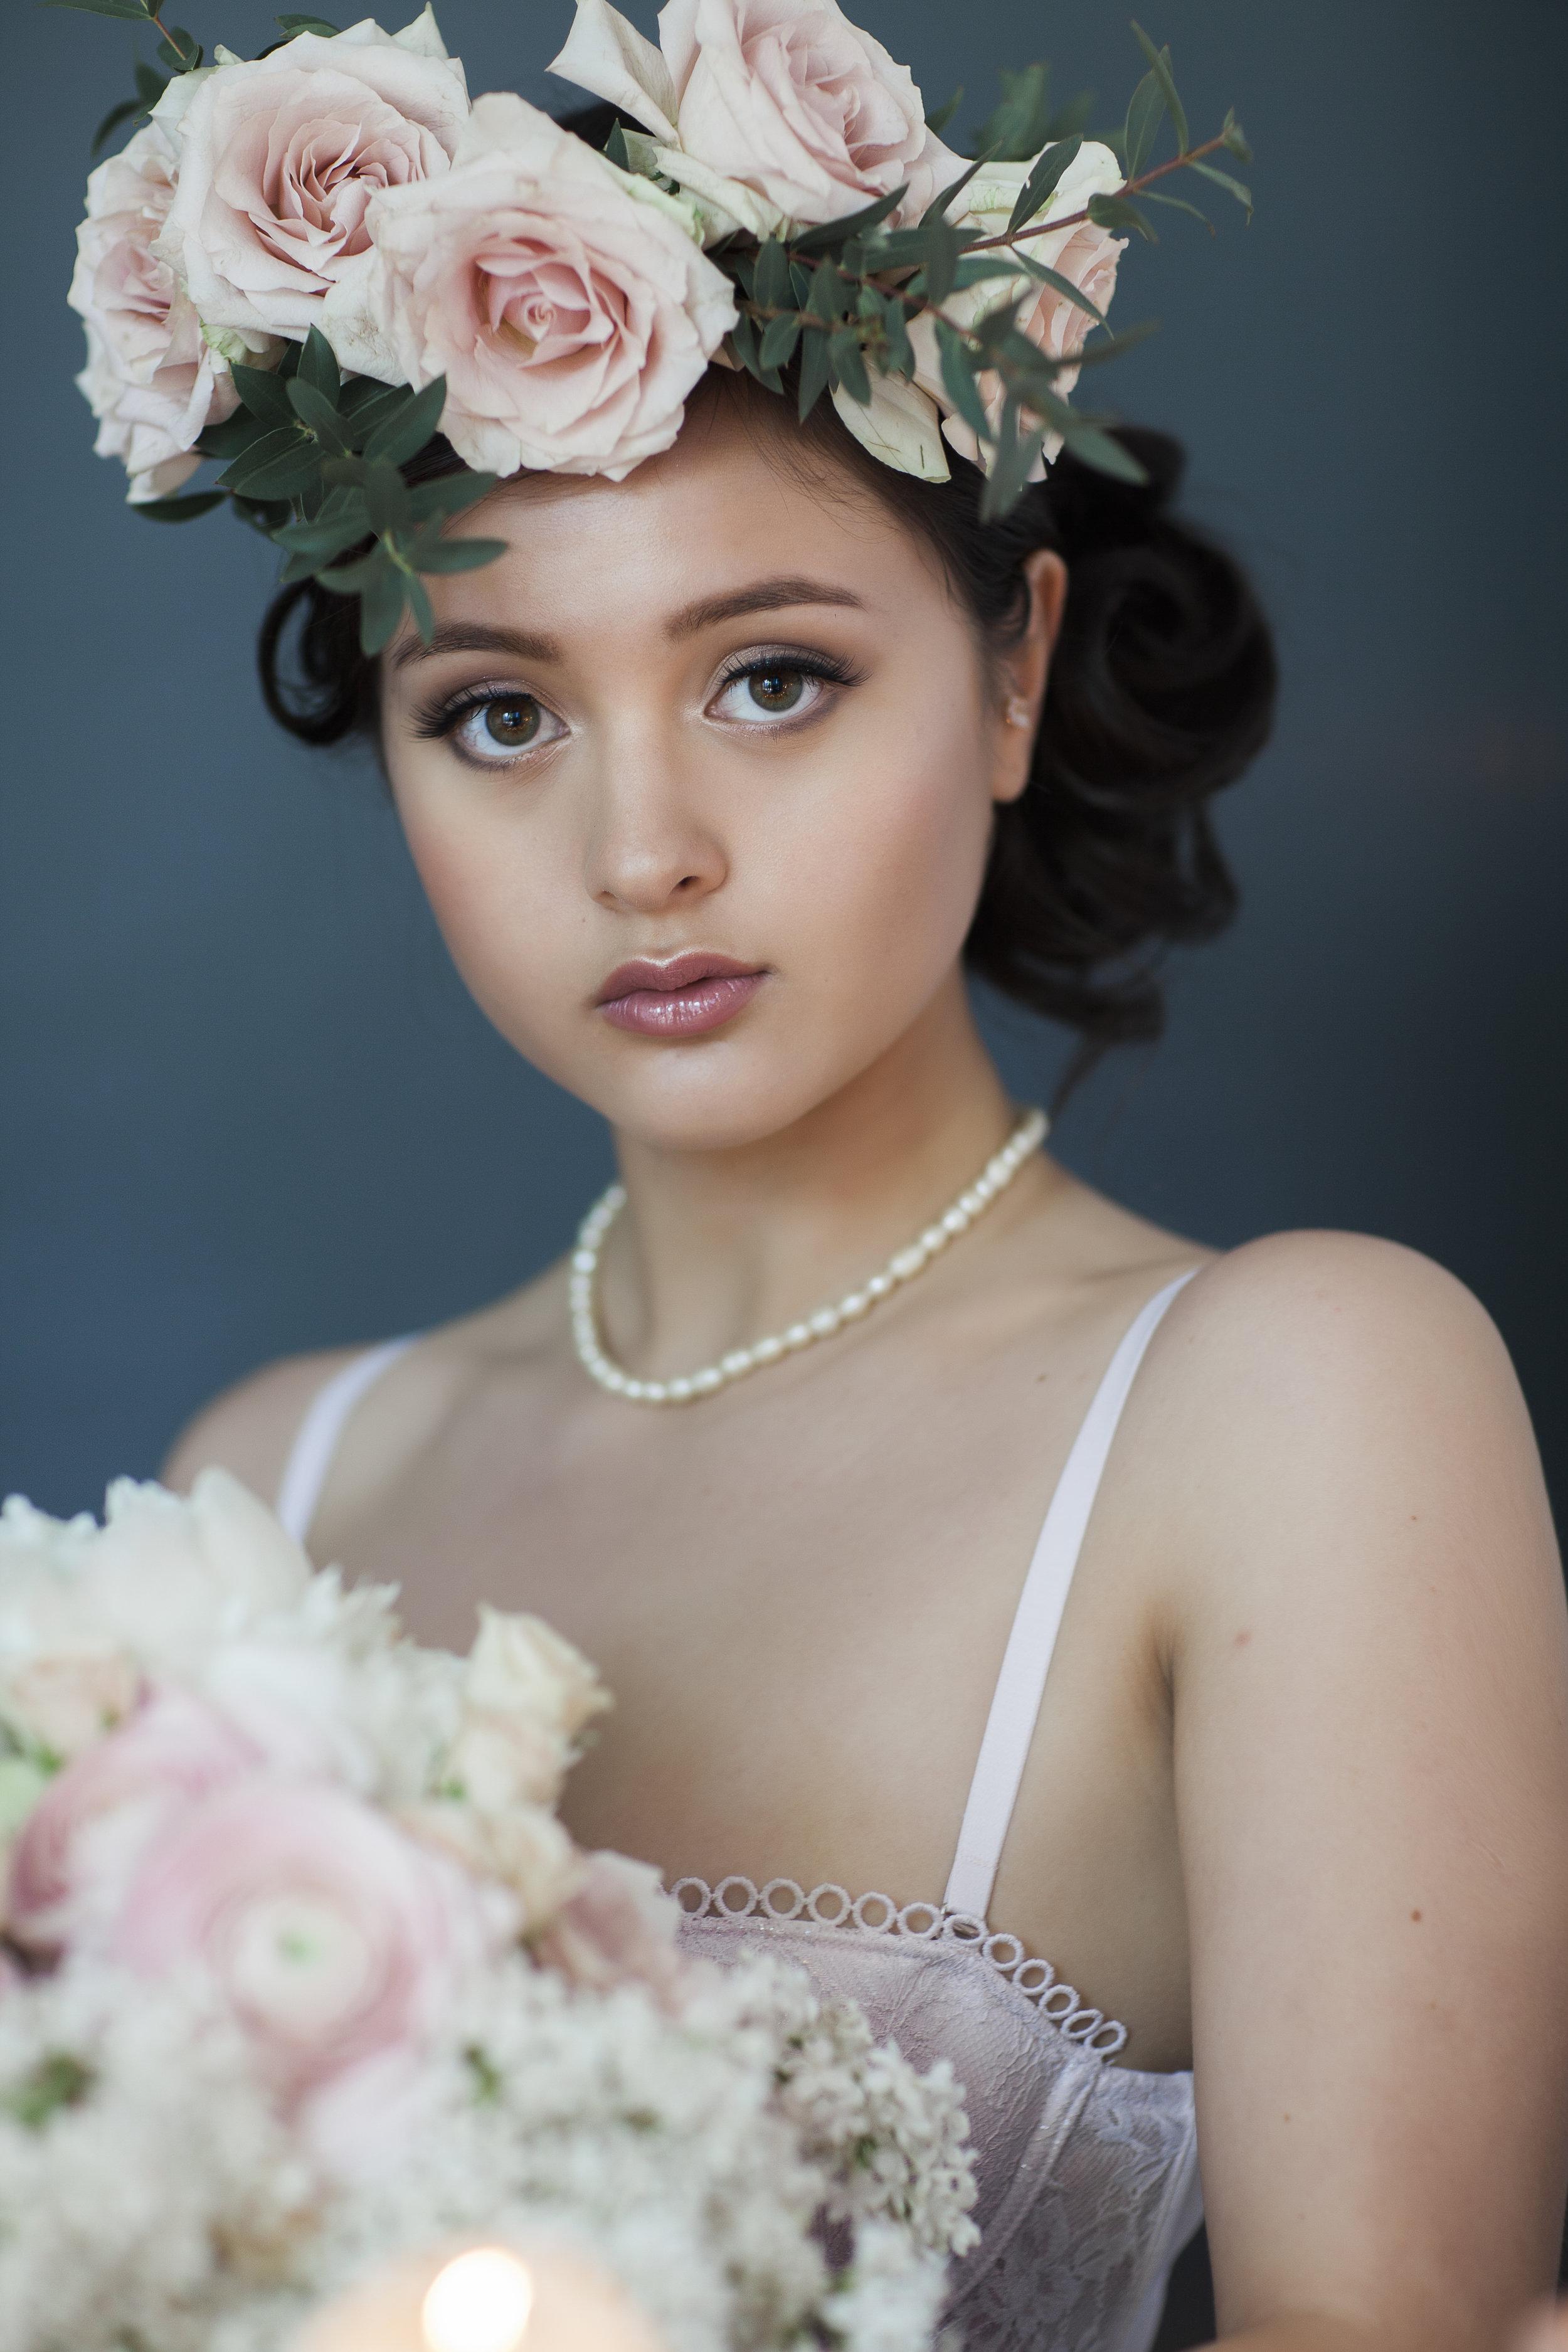 Wedding Add-ons - Bridal Makeup & Hair TrialFalse EyelashesAirbrush ApplicationHair ExtensionsOn-site Touch UpsEarly Start